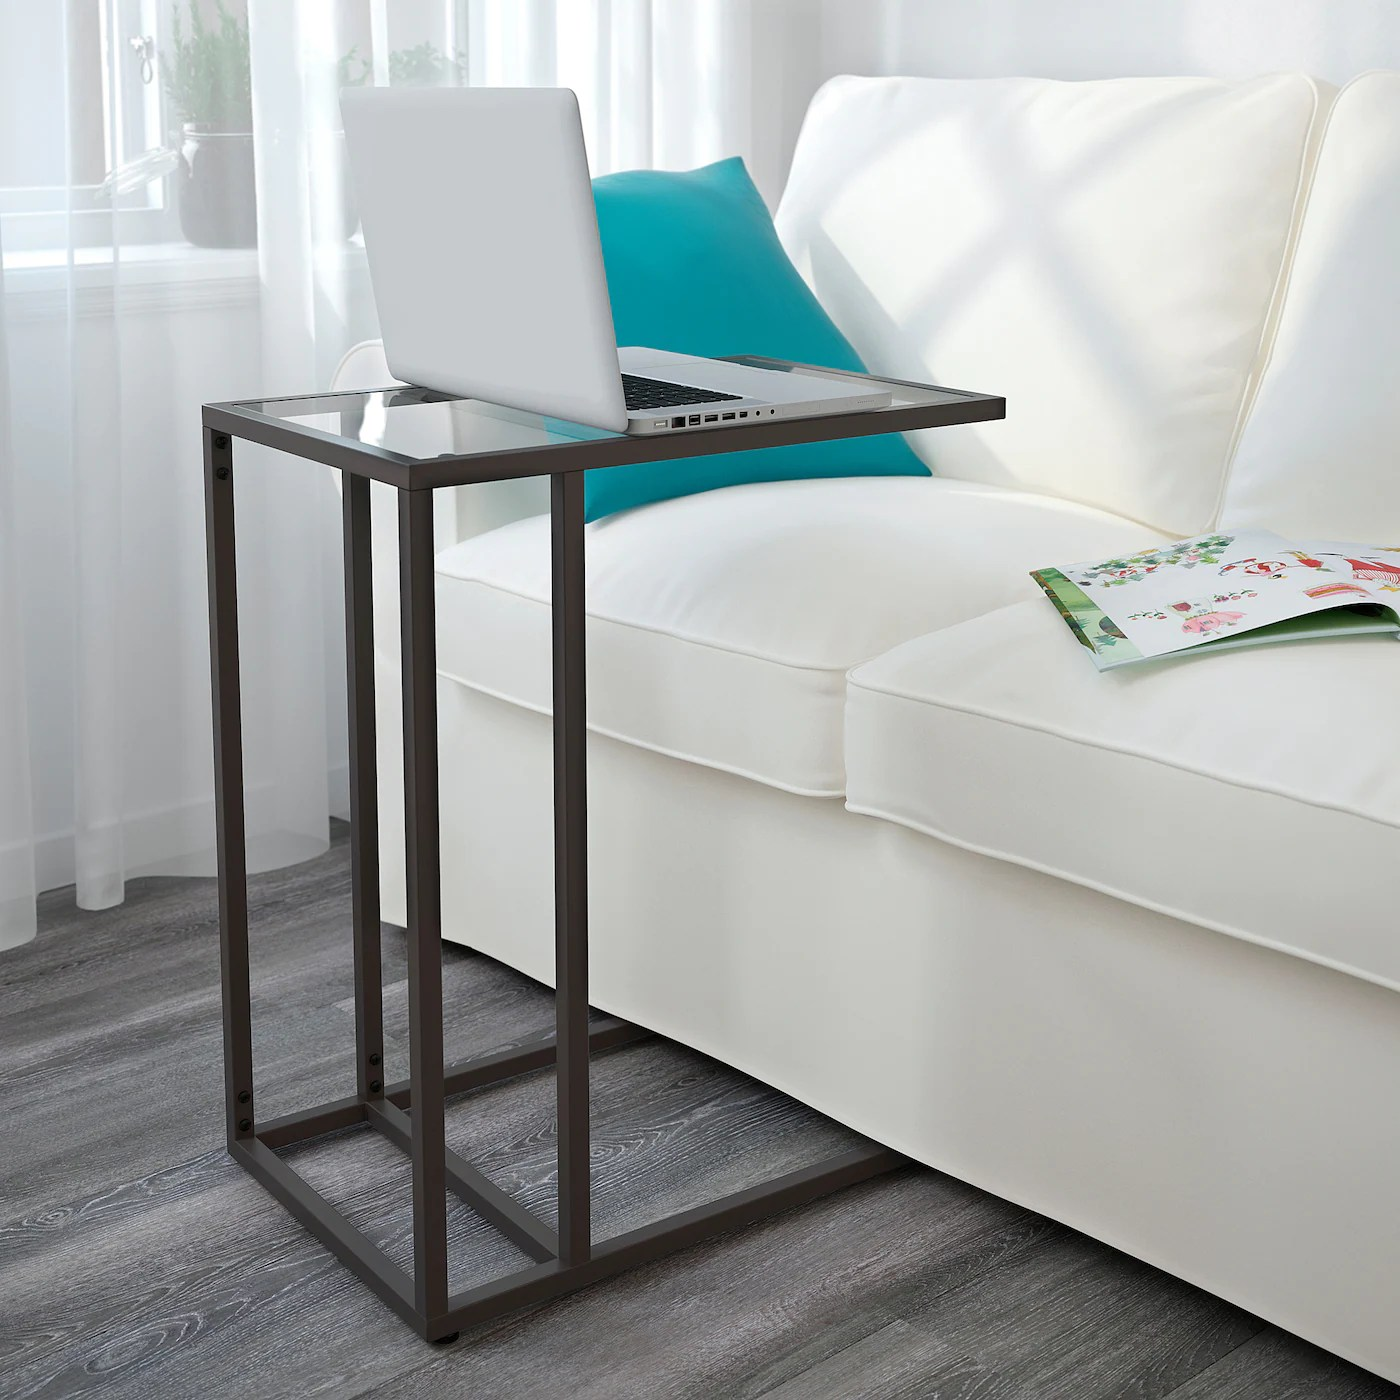 ikea scrivanie (foto) scrivania ikea bianca e arancione. Vittsjo Laptop Stand Black Brown Glass 13 3 4x25 5 8 Ikea